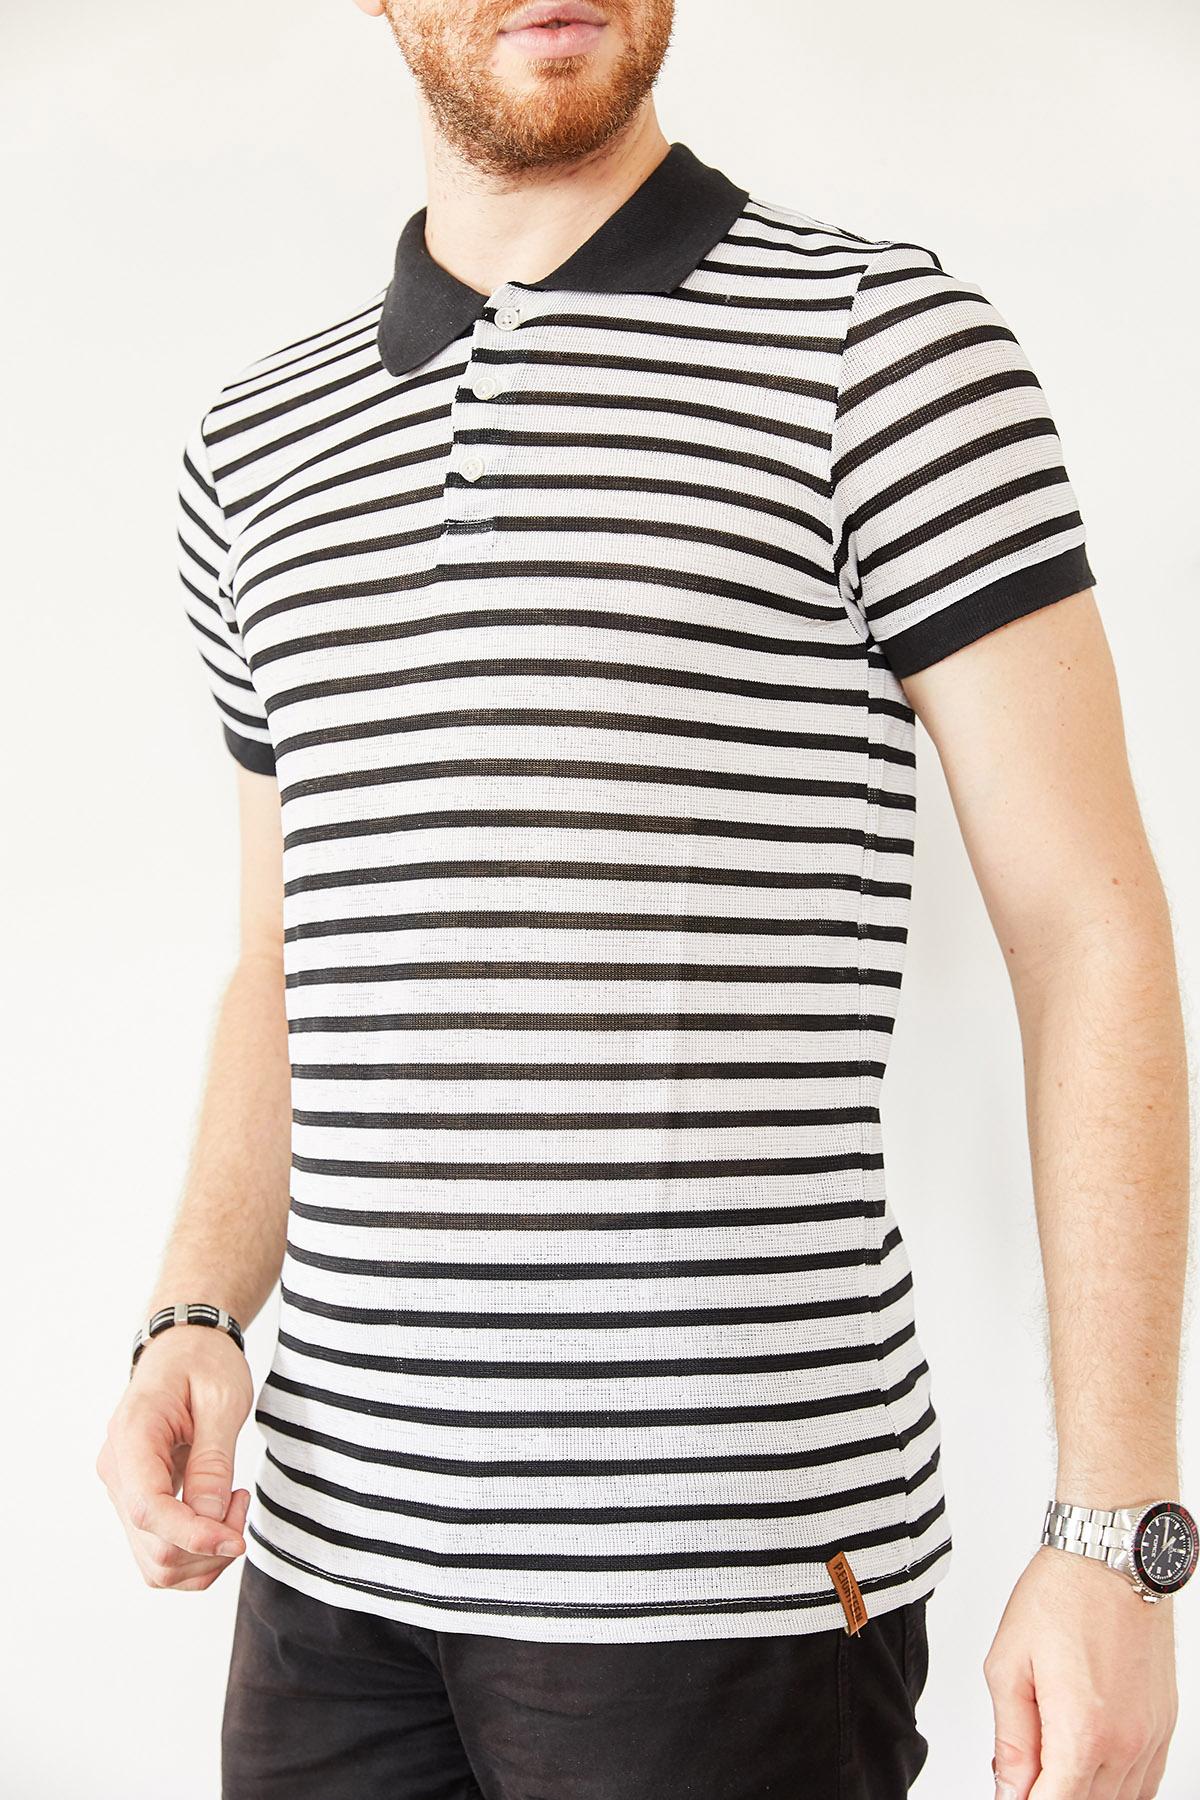 Beyaz & Siyah Polo Yaka Çizgili T-Shirt 0YXE1-44127-02 - Thumbnail